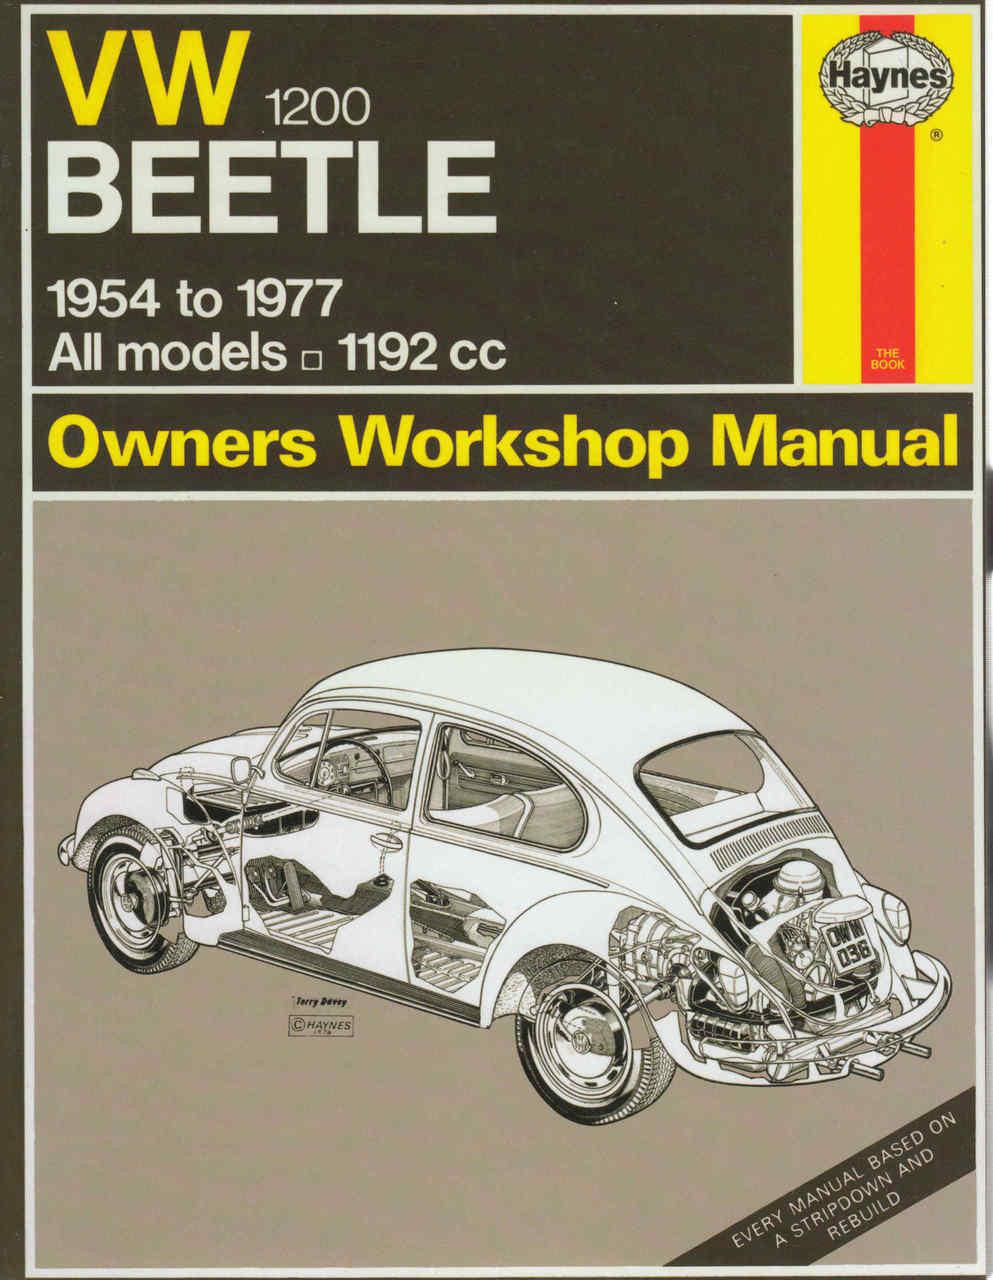 owners workshop manual beetle professional user manual ebooks u2022 rh gogradresumes com 1970 vw beetle owners manual pdf 2017 vw beetle owners manual pdf